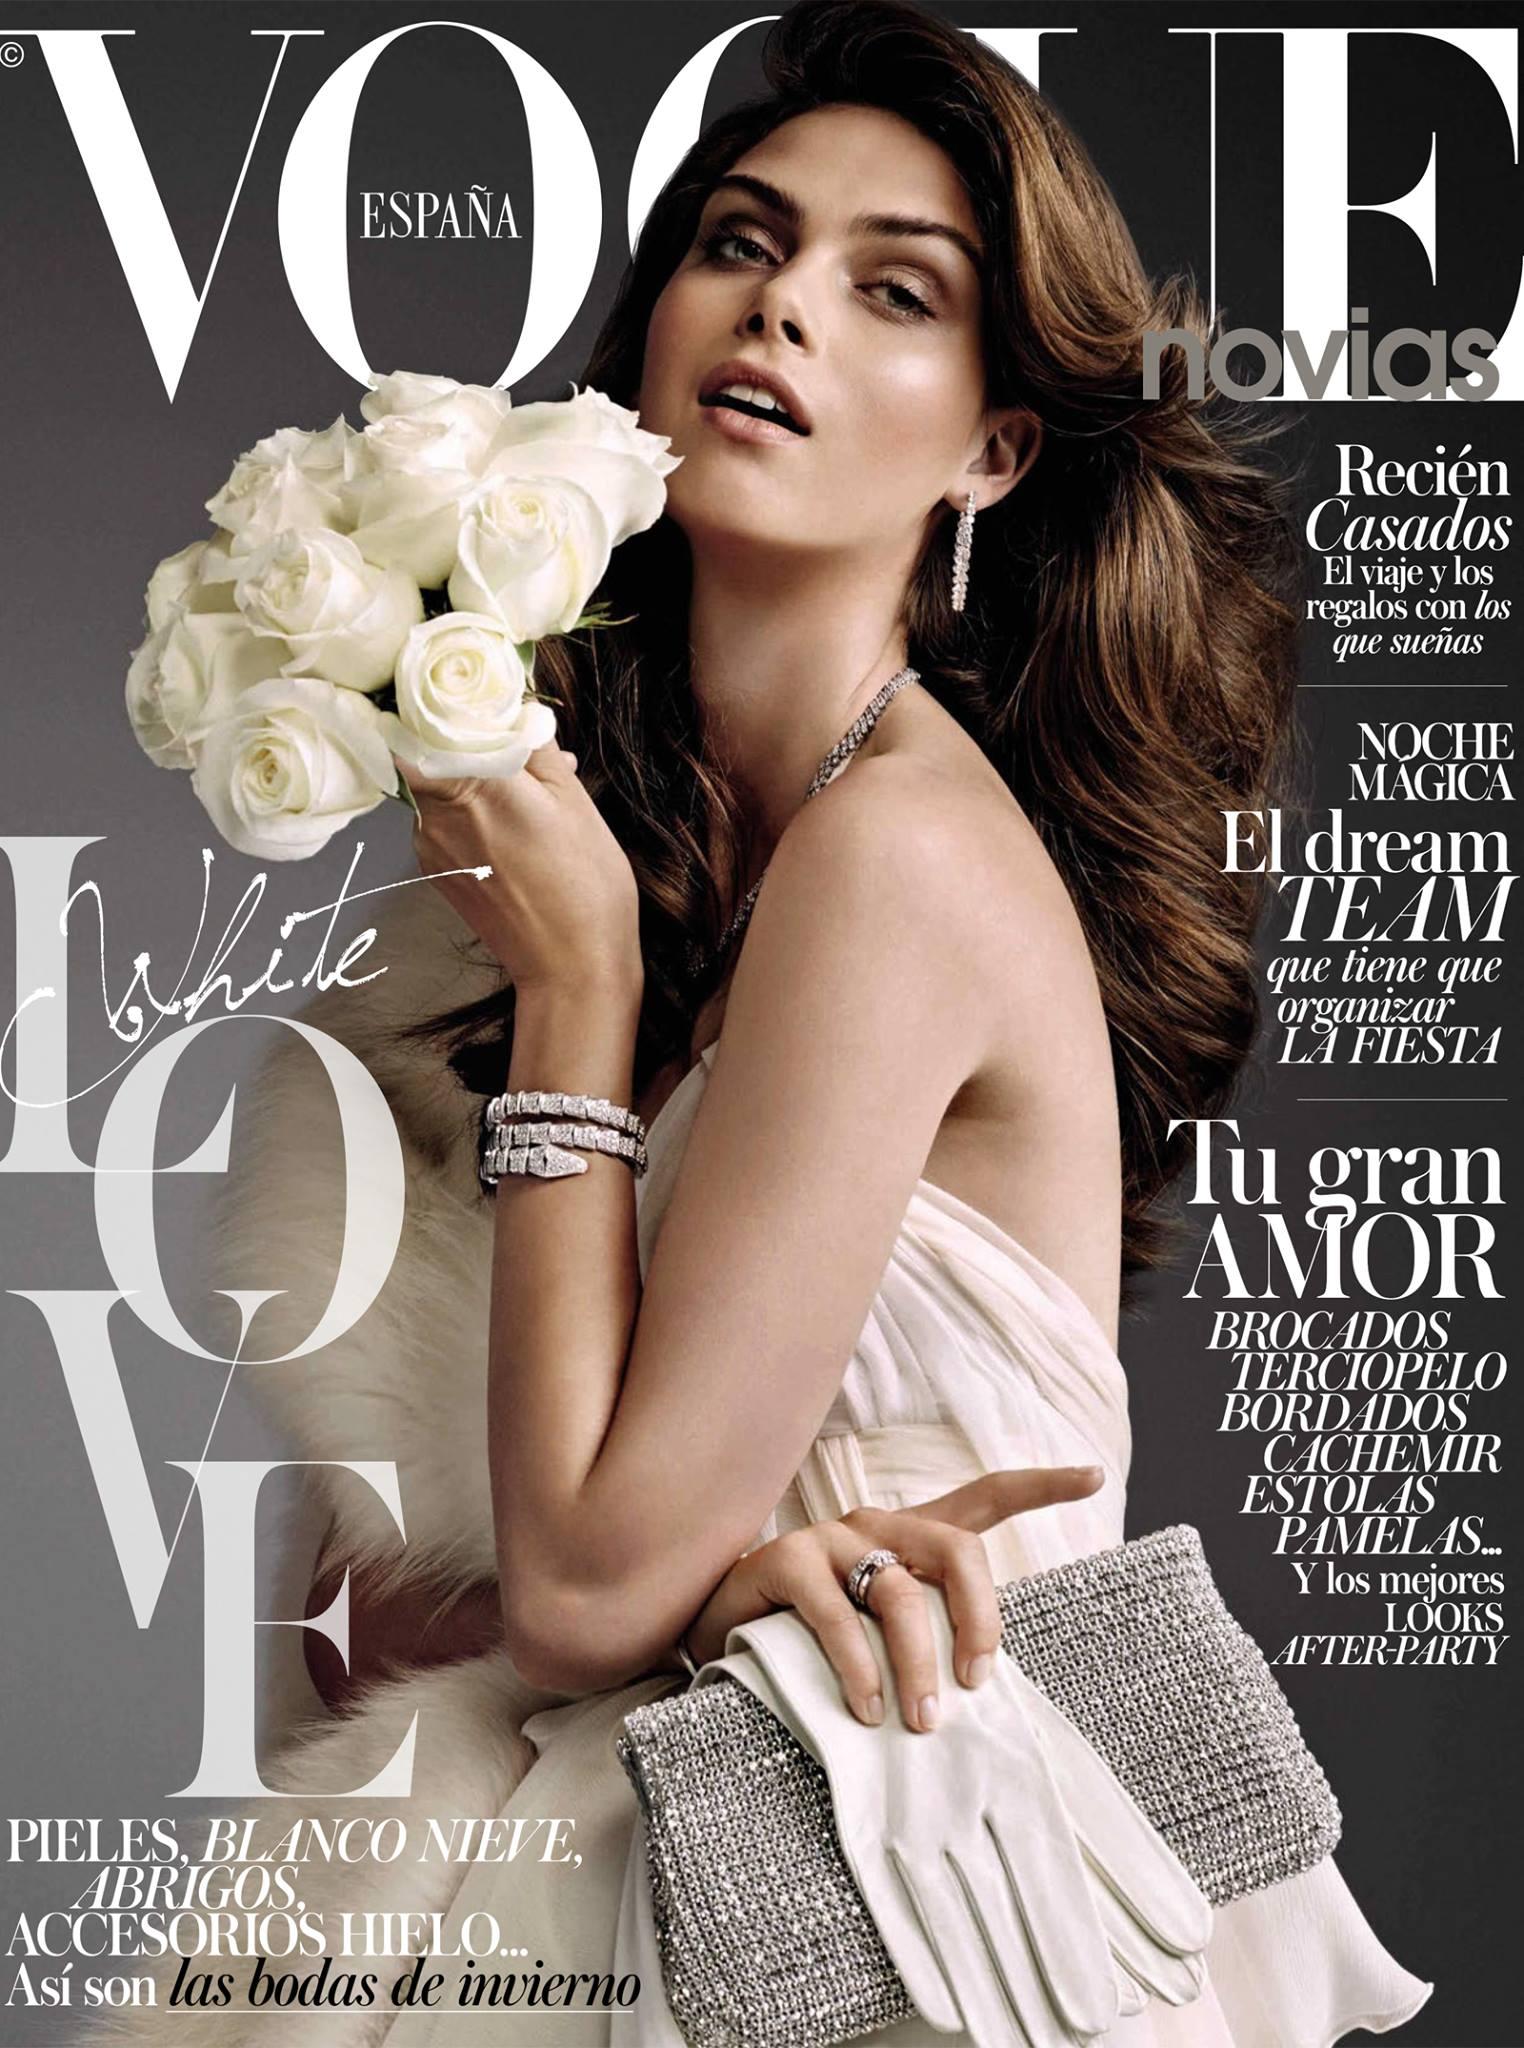 Vogue España Novias October 2014 | Andoni & Arantxa | Vogue España Novias | Sara Fernández Castro | Numerique Retouch Photo Retouching Studio